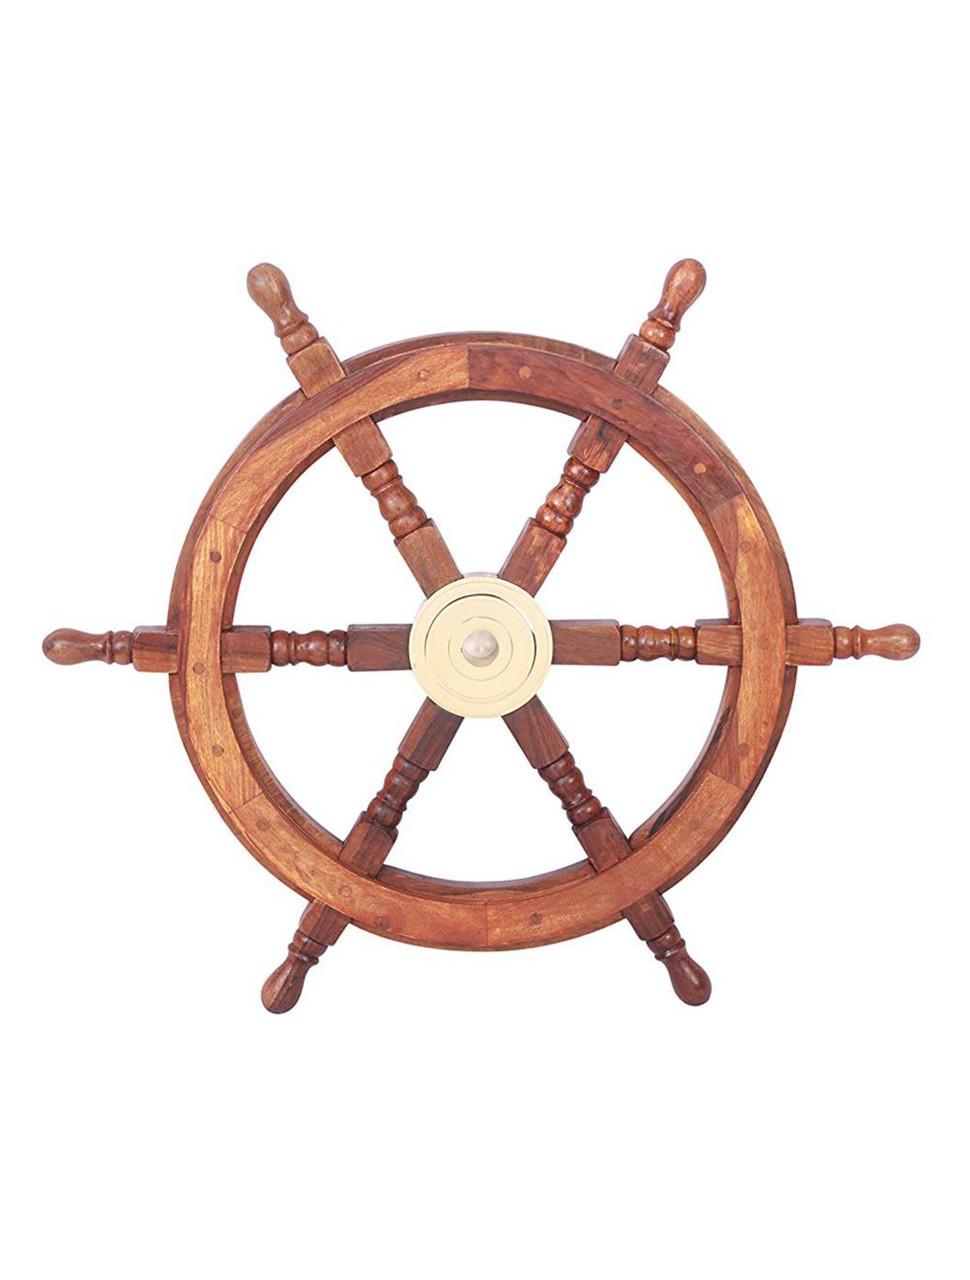 "Boat Ships Steering Wheel 24"" Teak Wood Brass Hub Nautical Decor"